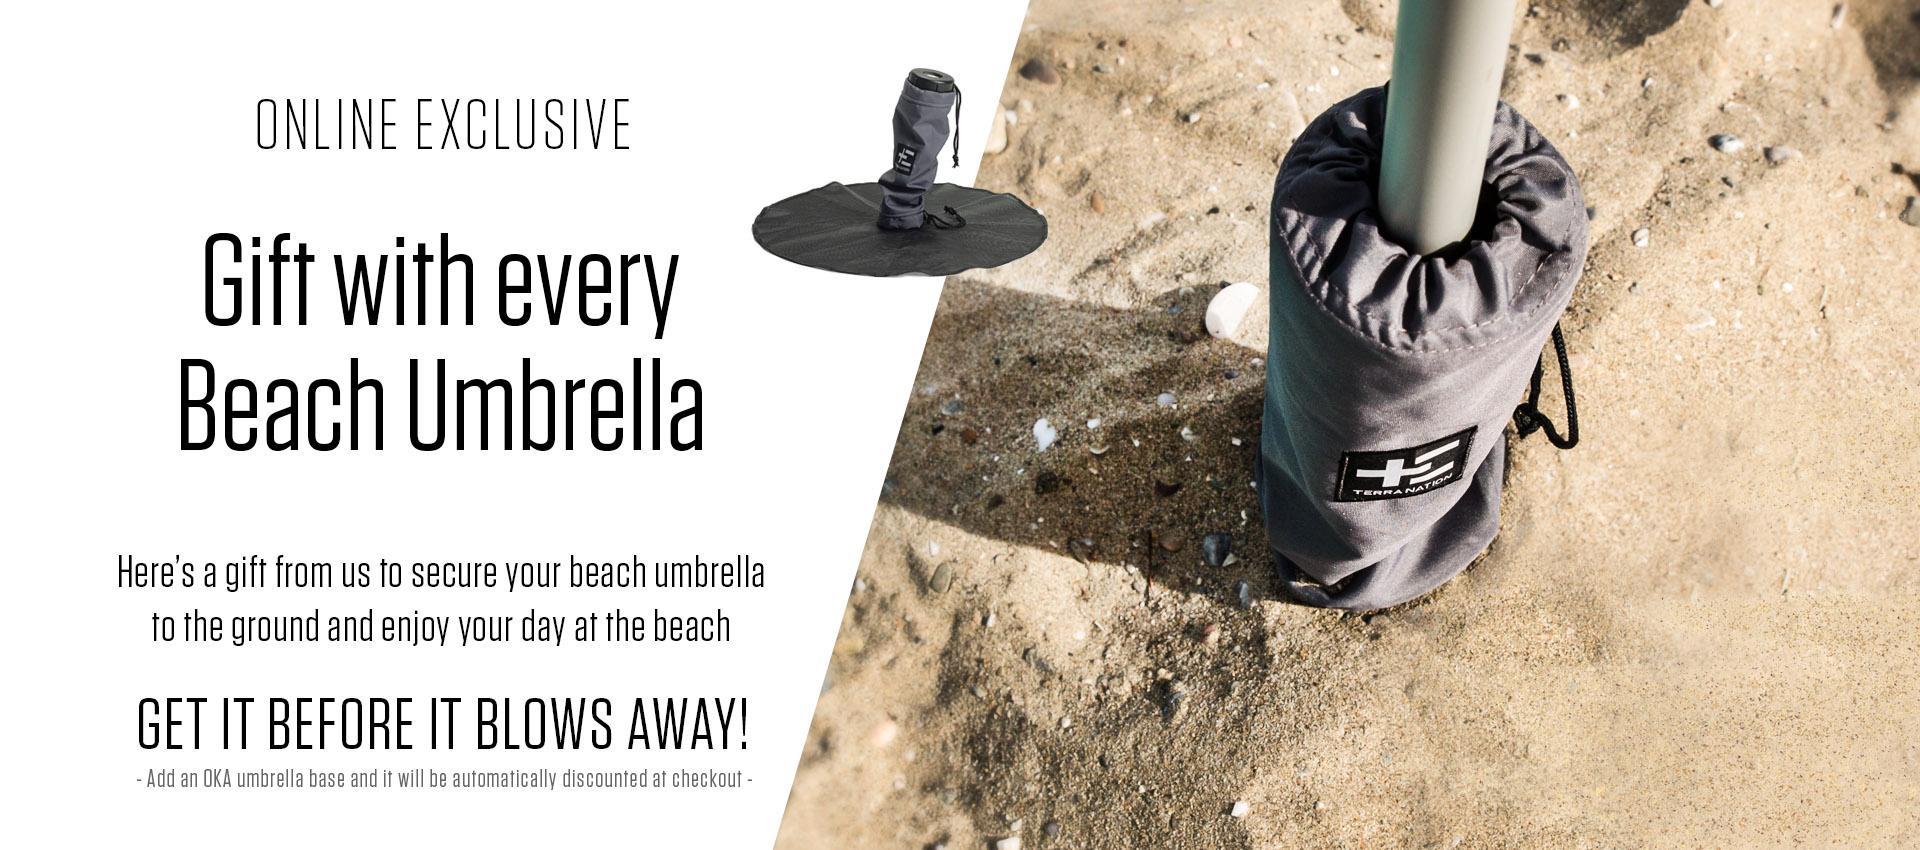 With every Beach Umbrella get 1 OKA beach base free